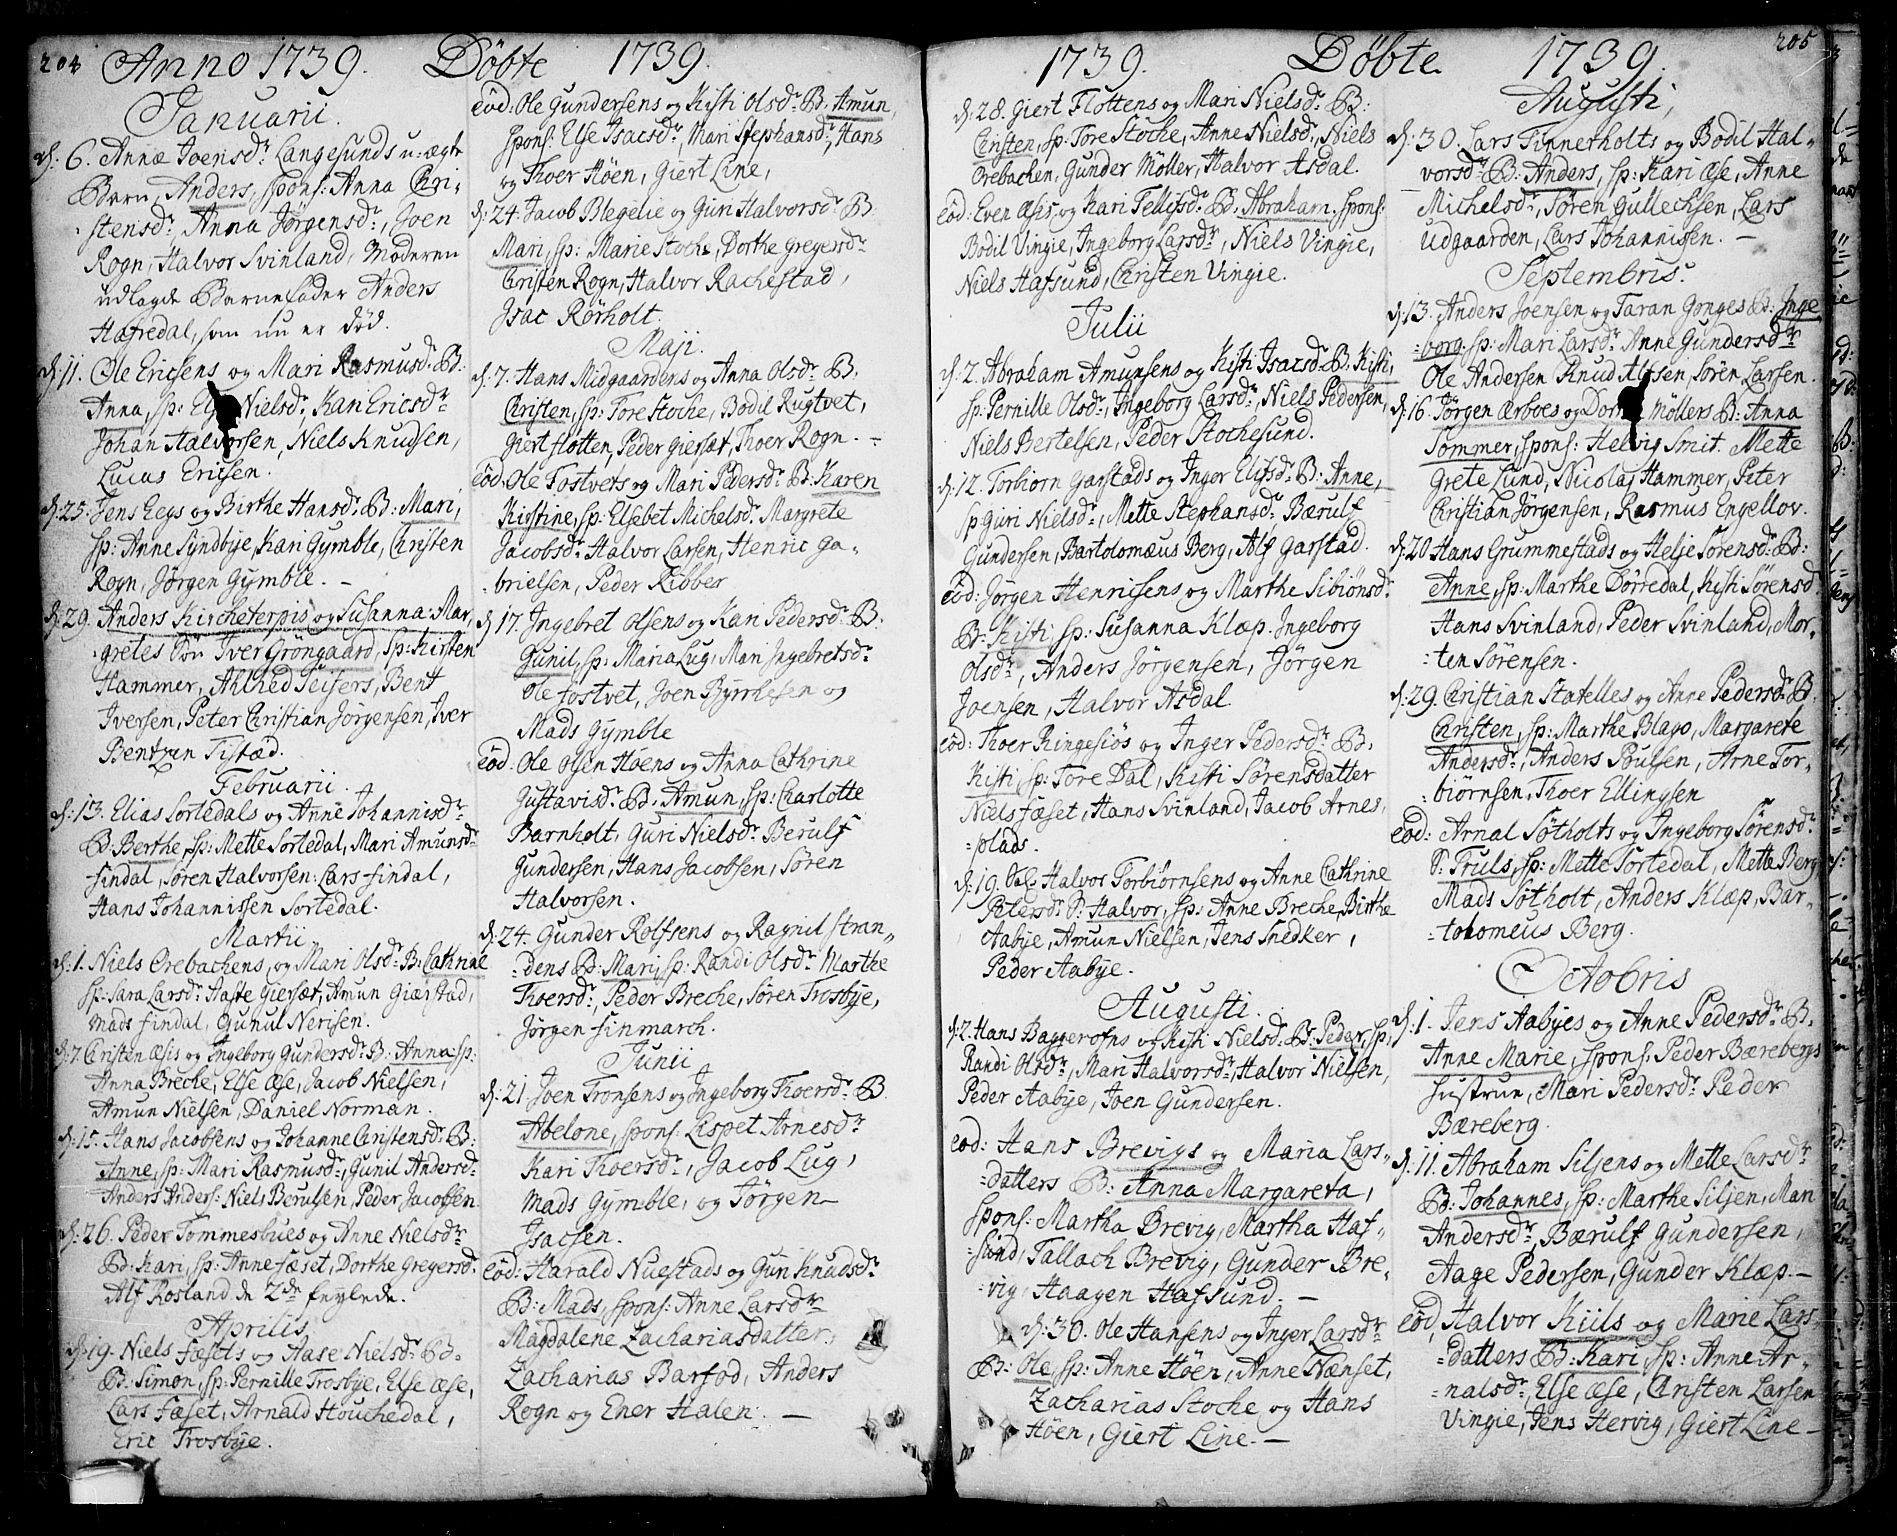 SAKO, Bamble kirkebøker, F/Fa/L0001: Ministerialbok nr. I 1, 1702-1774, s. 204-205